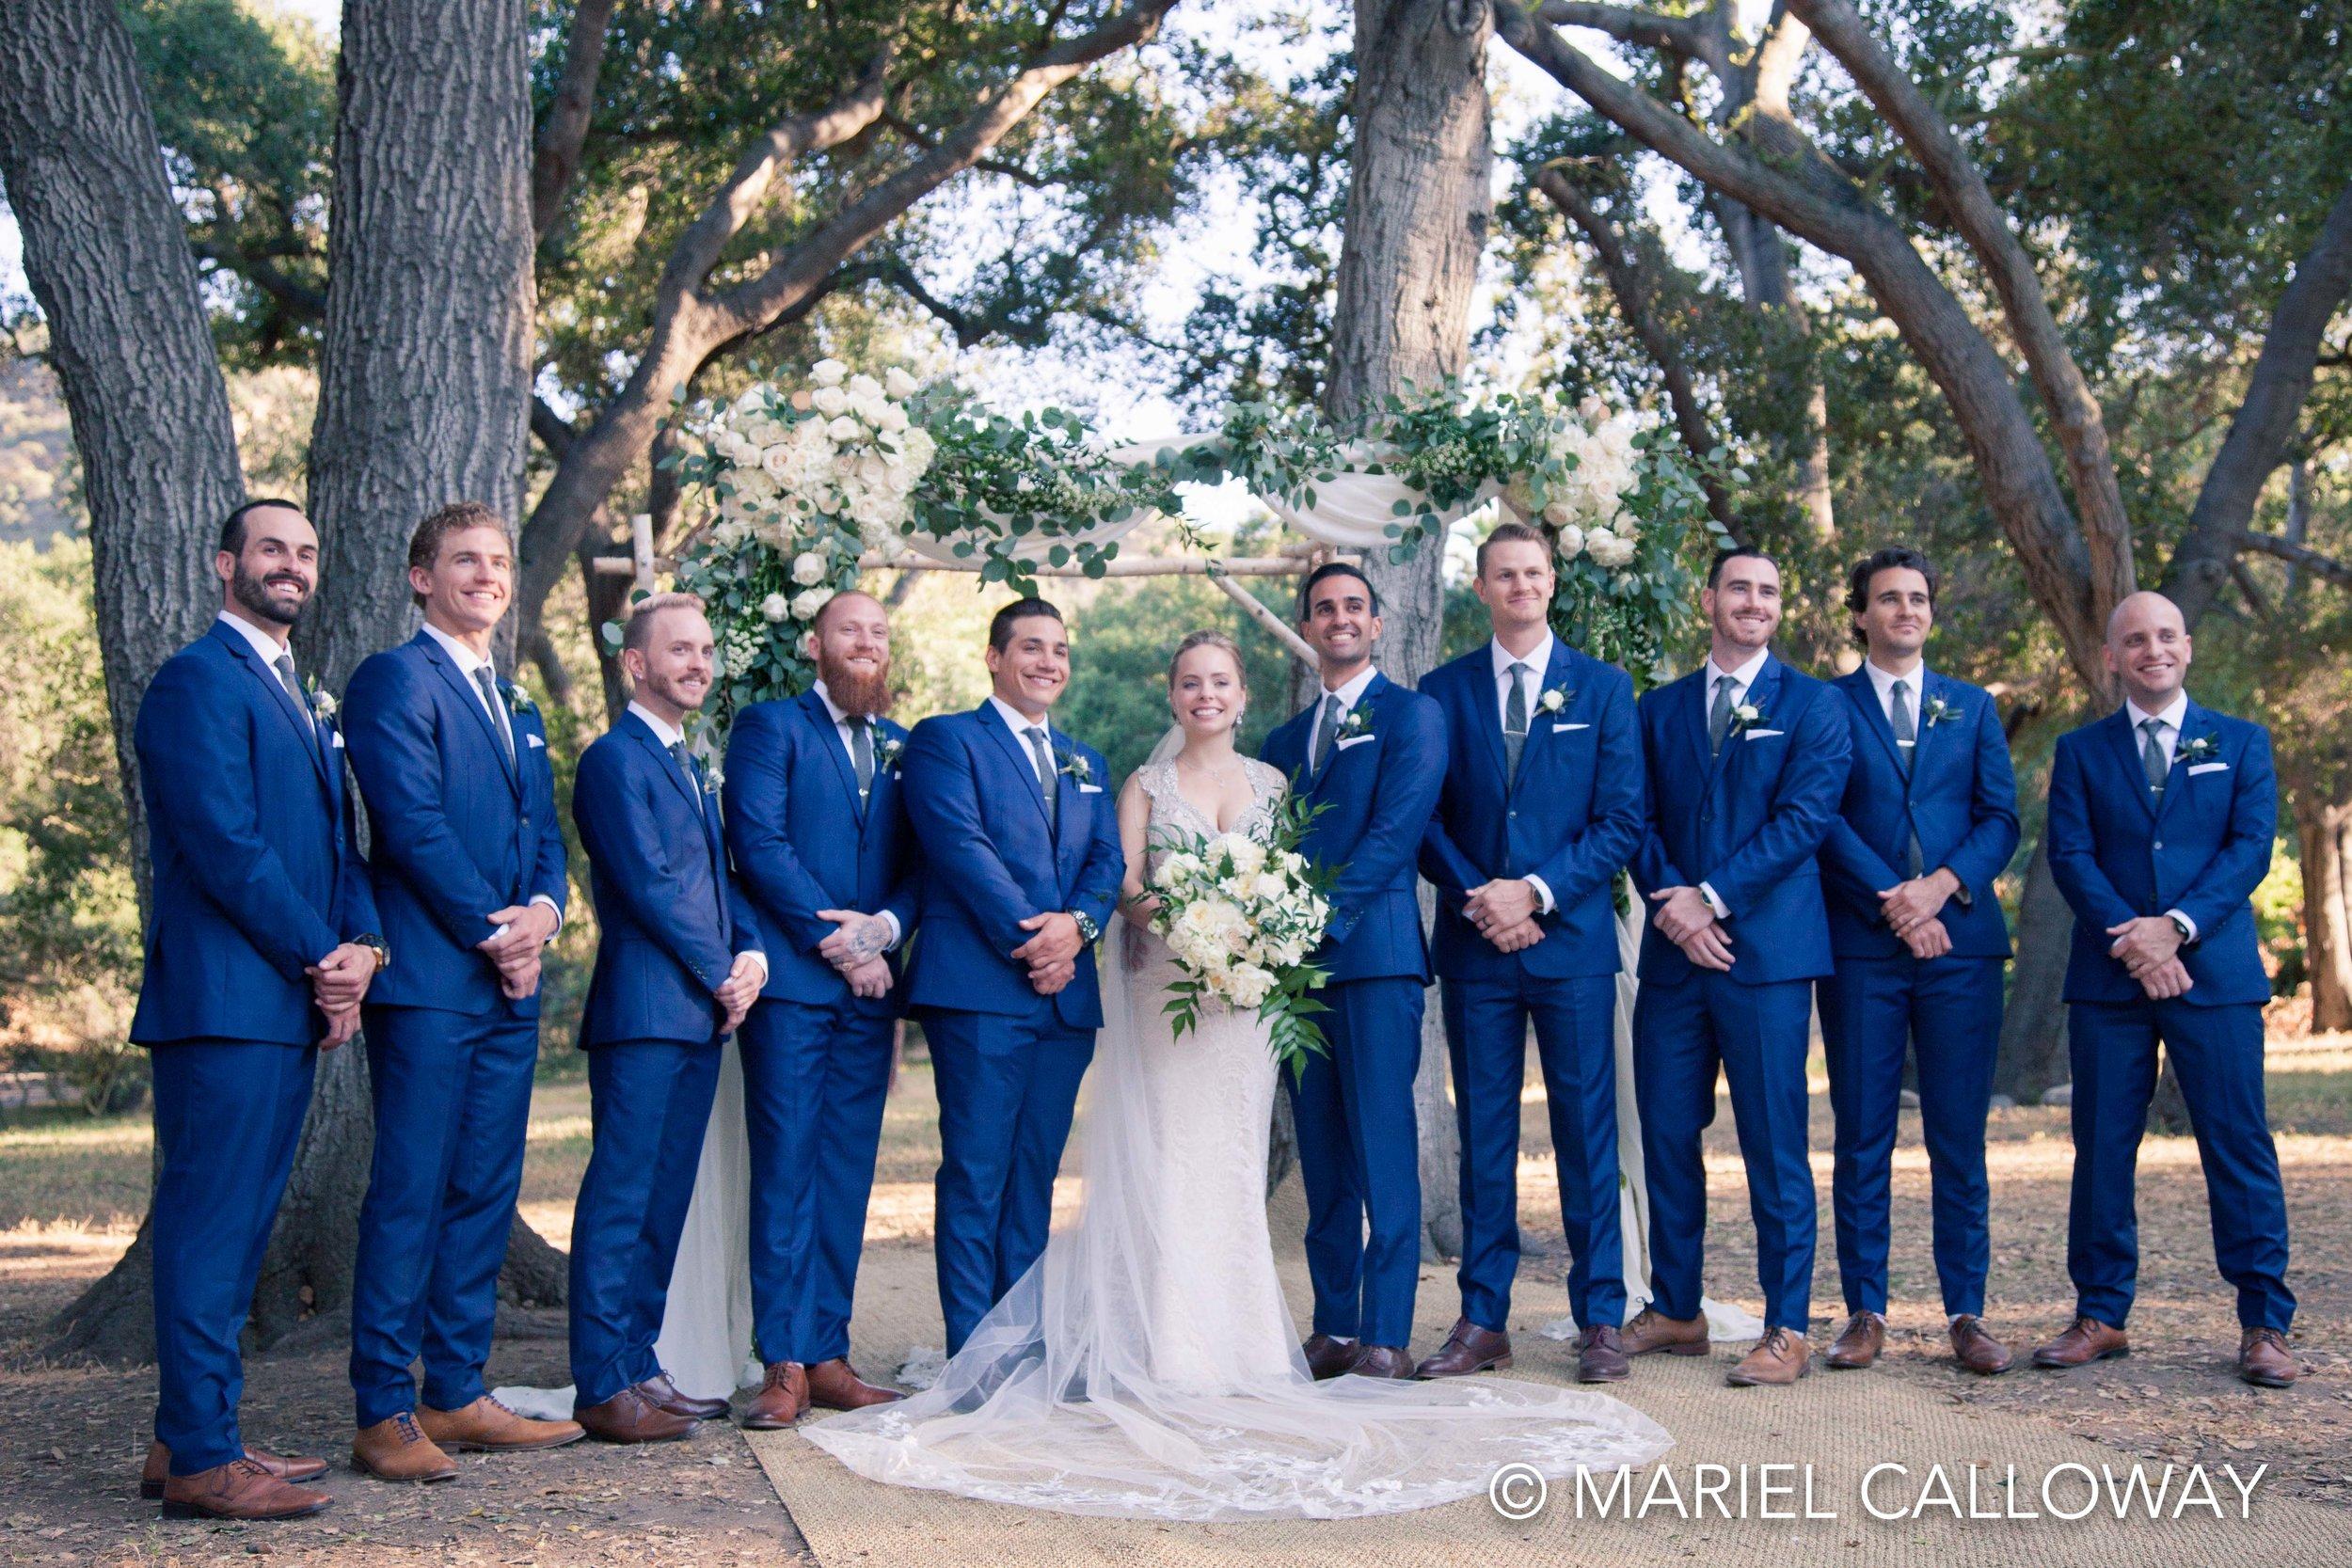 Mariel-Calloway-Los-Angeles-Wedding-Photography-Smith-27.jpg